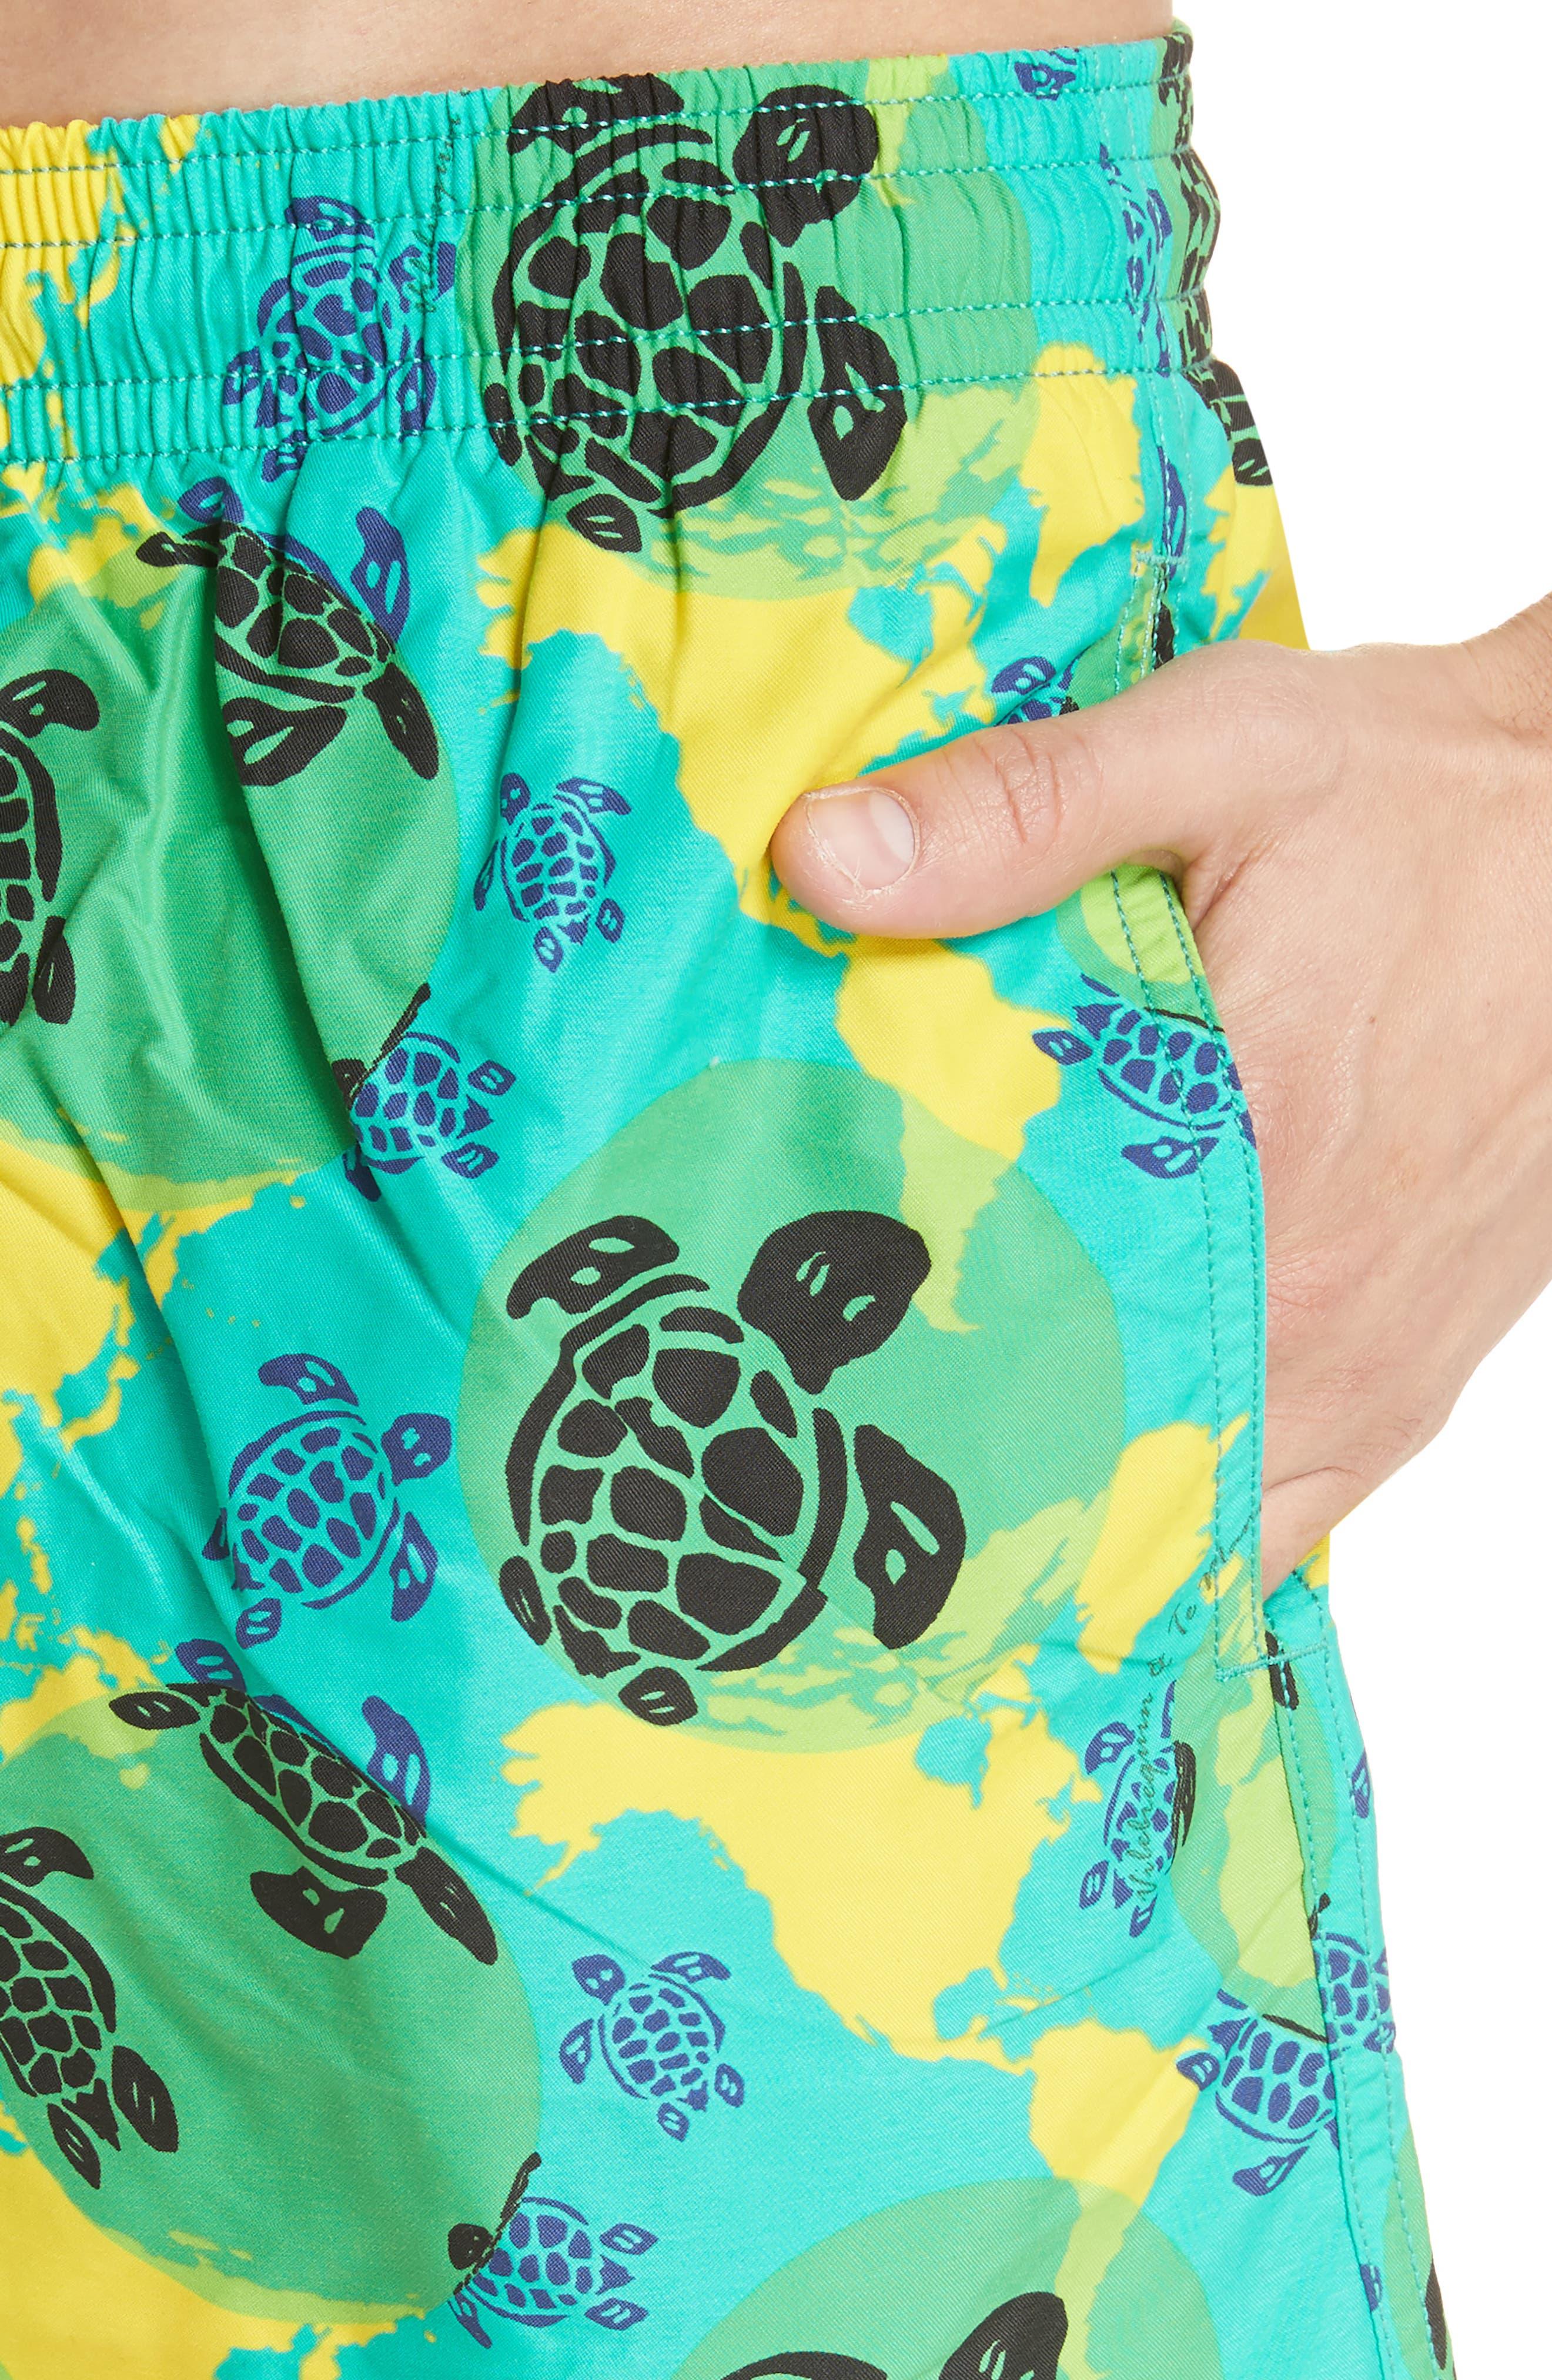 Eco Turtle Print Swim Trunks,                             Alternate thumbnail 4, color,                             VERONESE GREEN